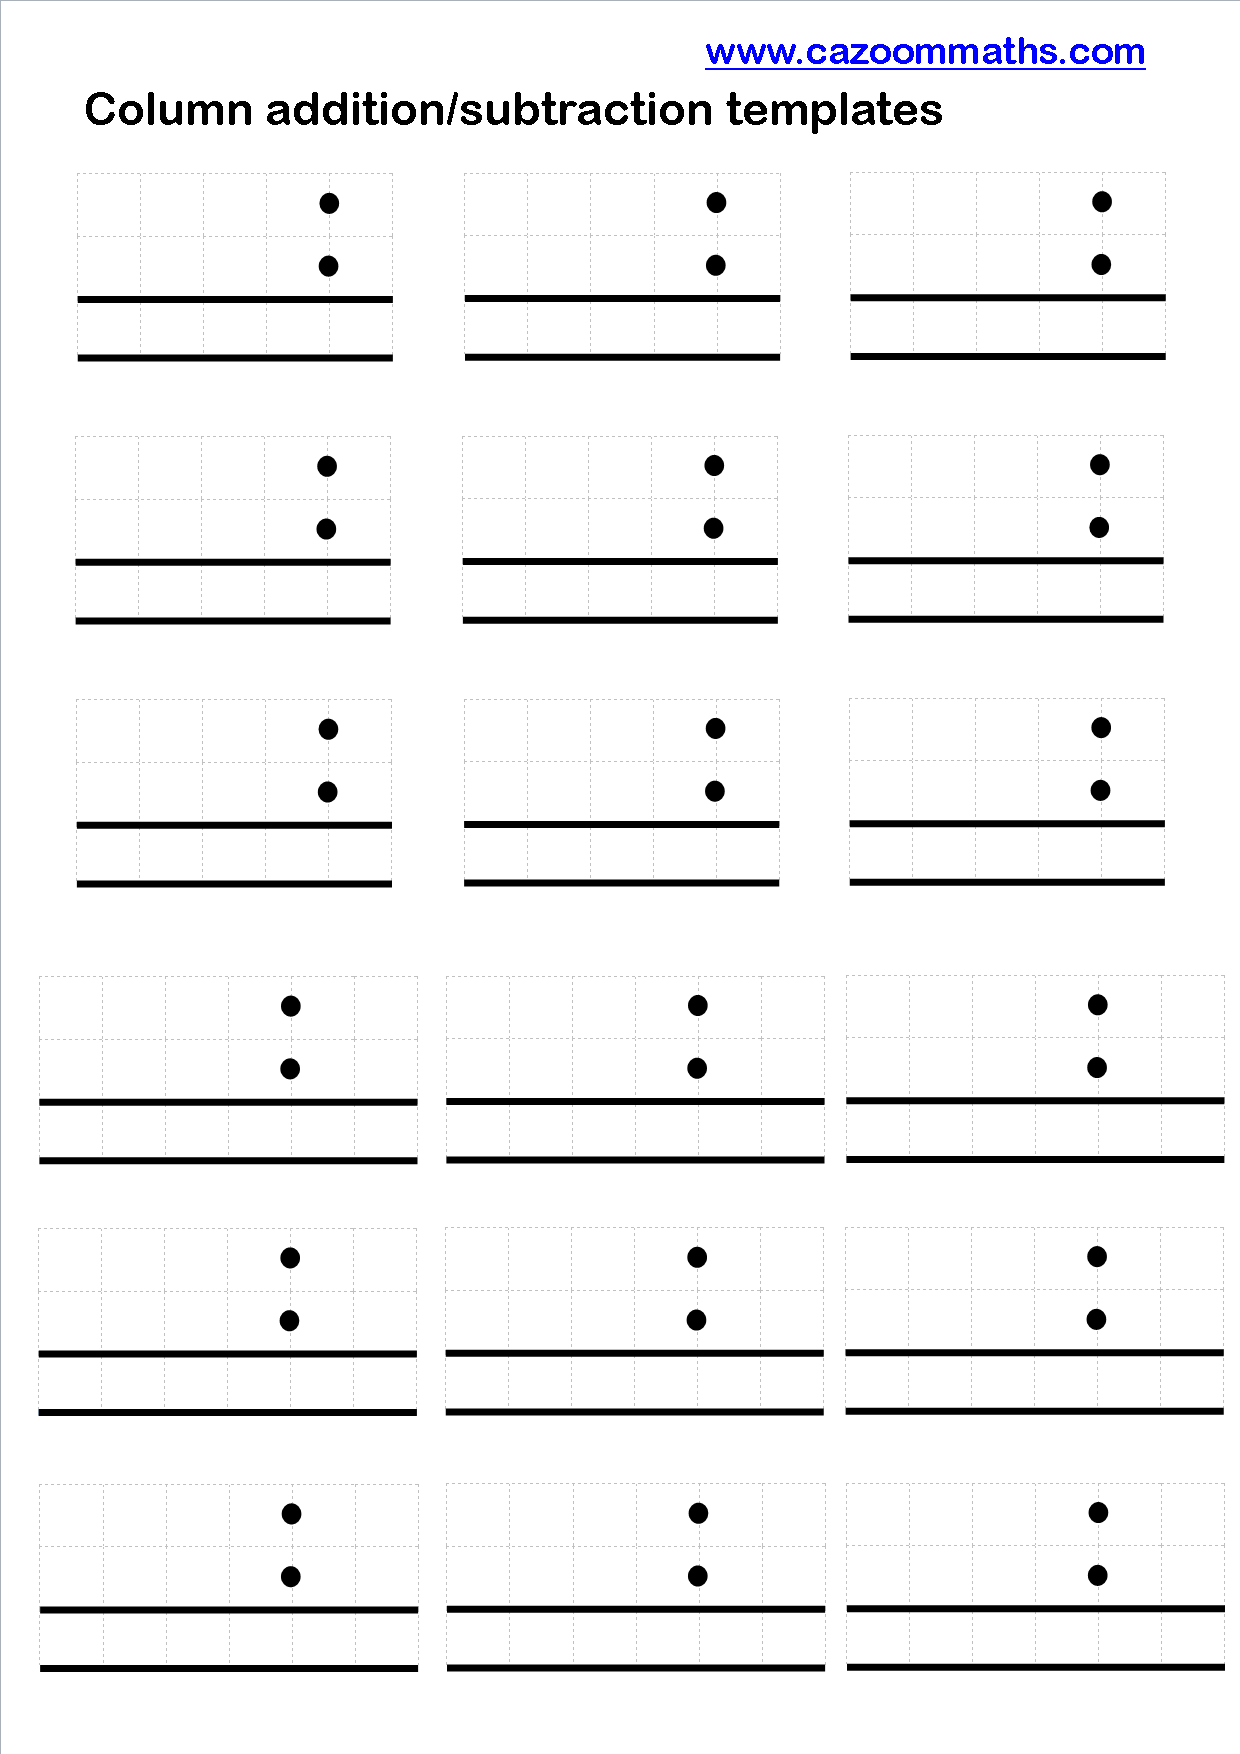 Adding And Subtracting Decimals Column Templates